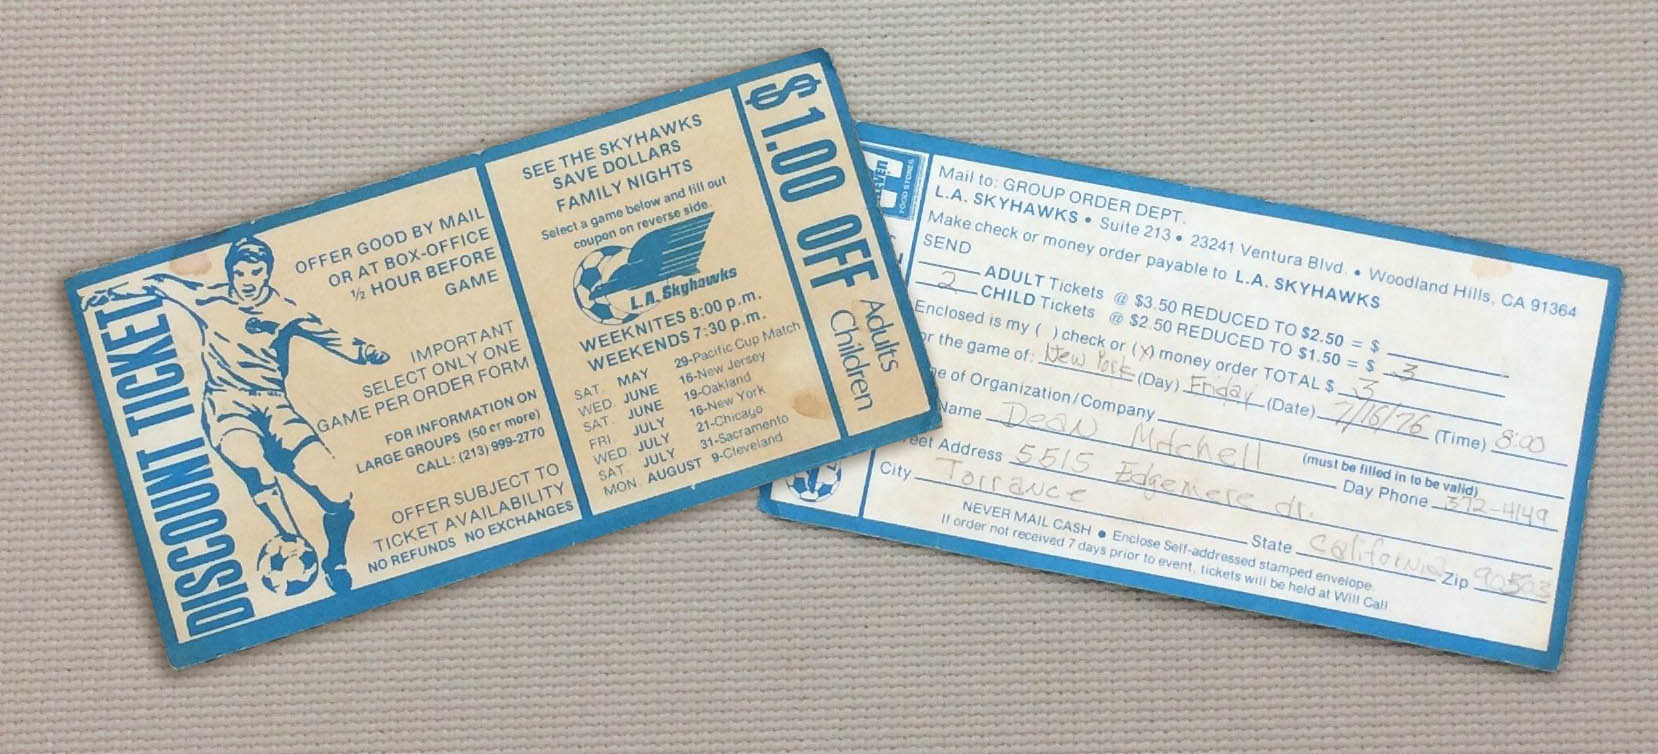 Los Angeles Skyhawks Ticket